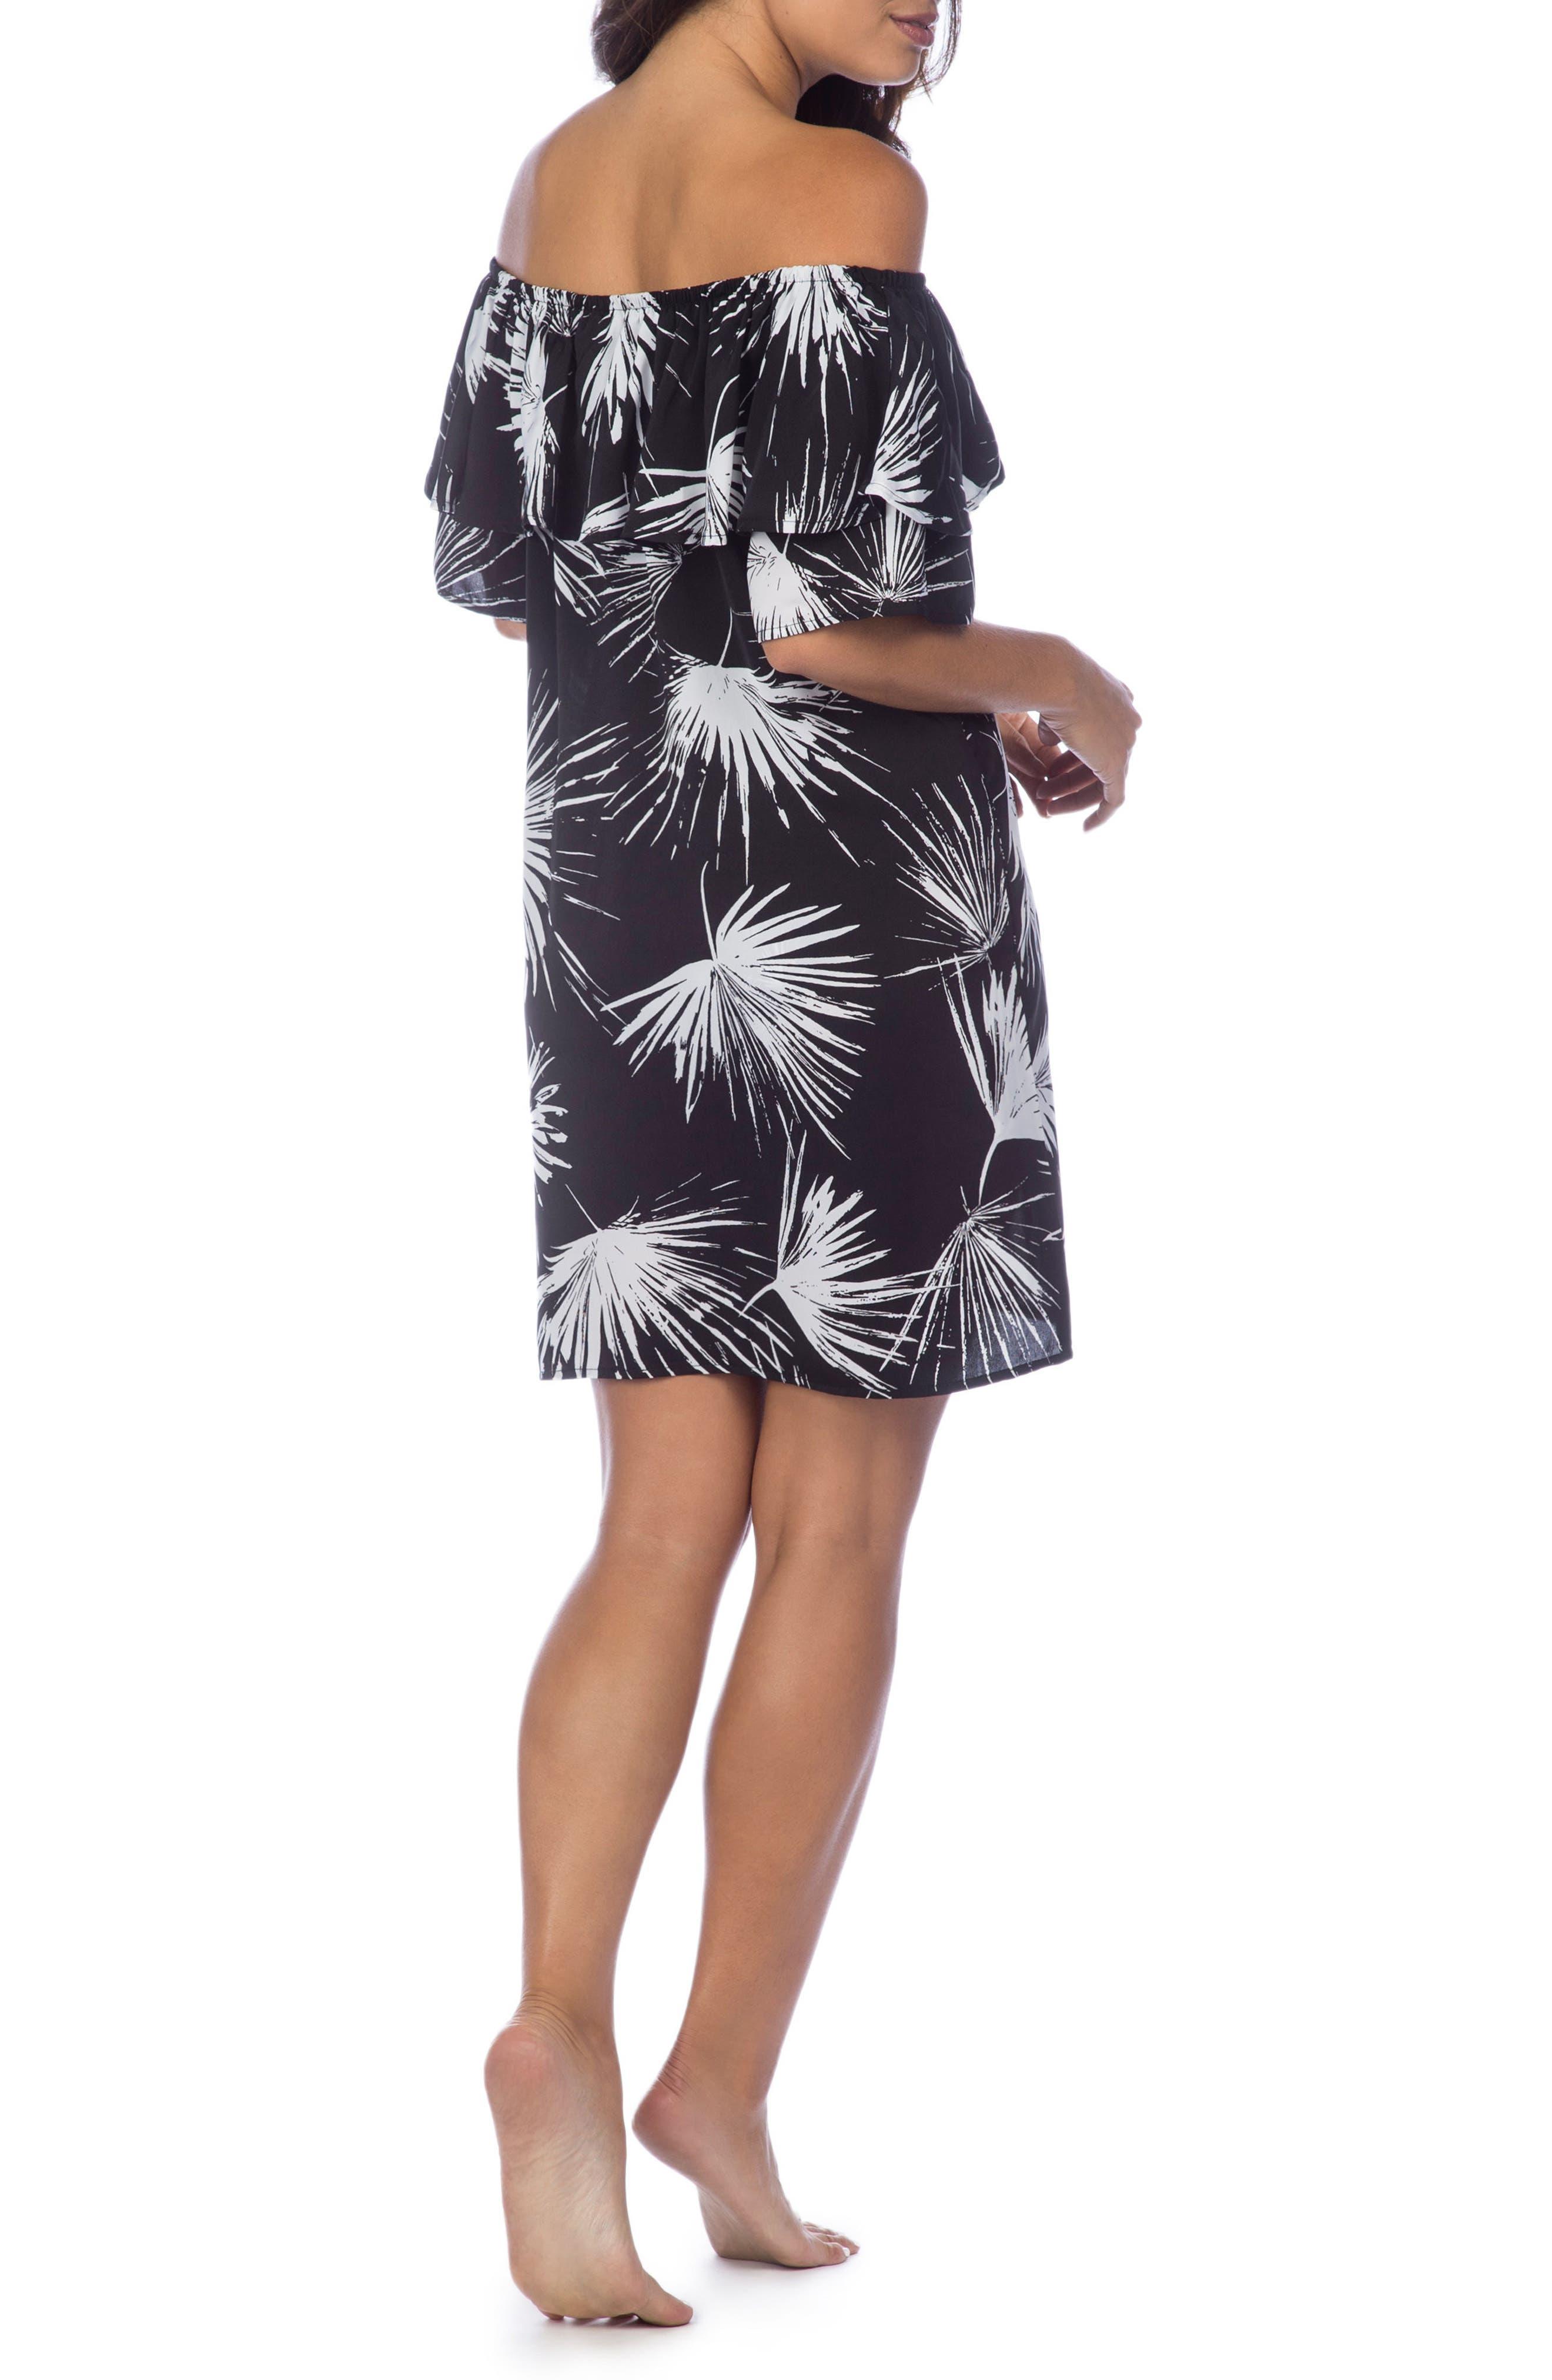 Petal Pusher Off the Shoulder Dress,                             Alternate thumbnail 2, color,                             Black/ White